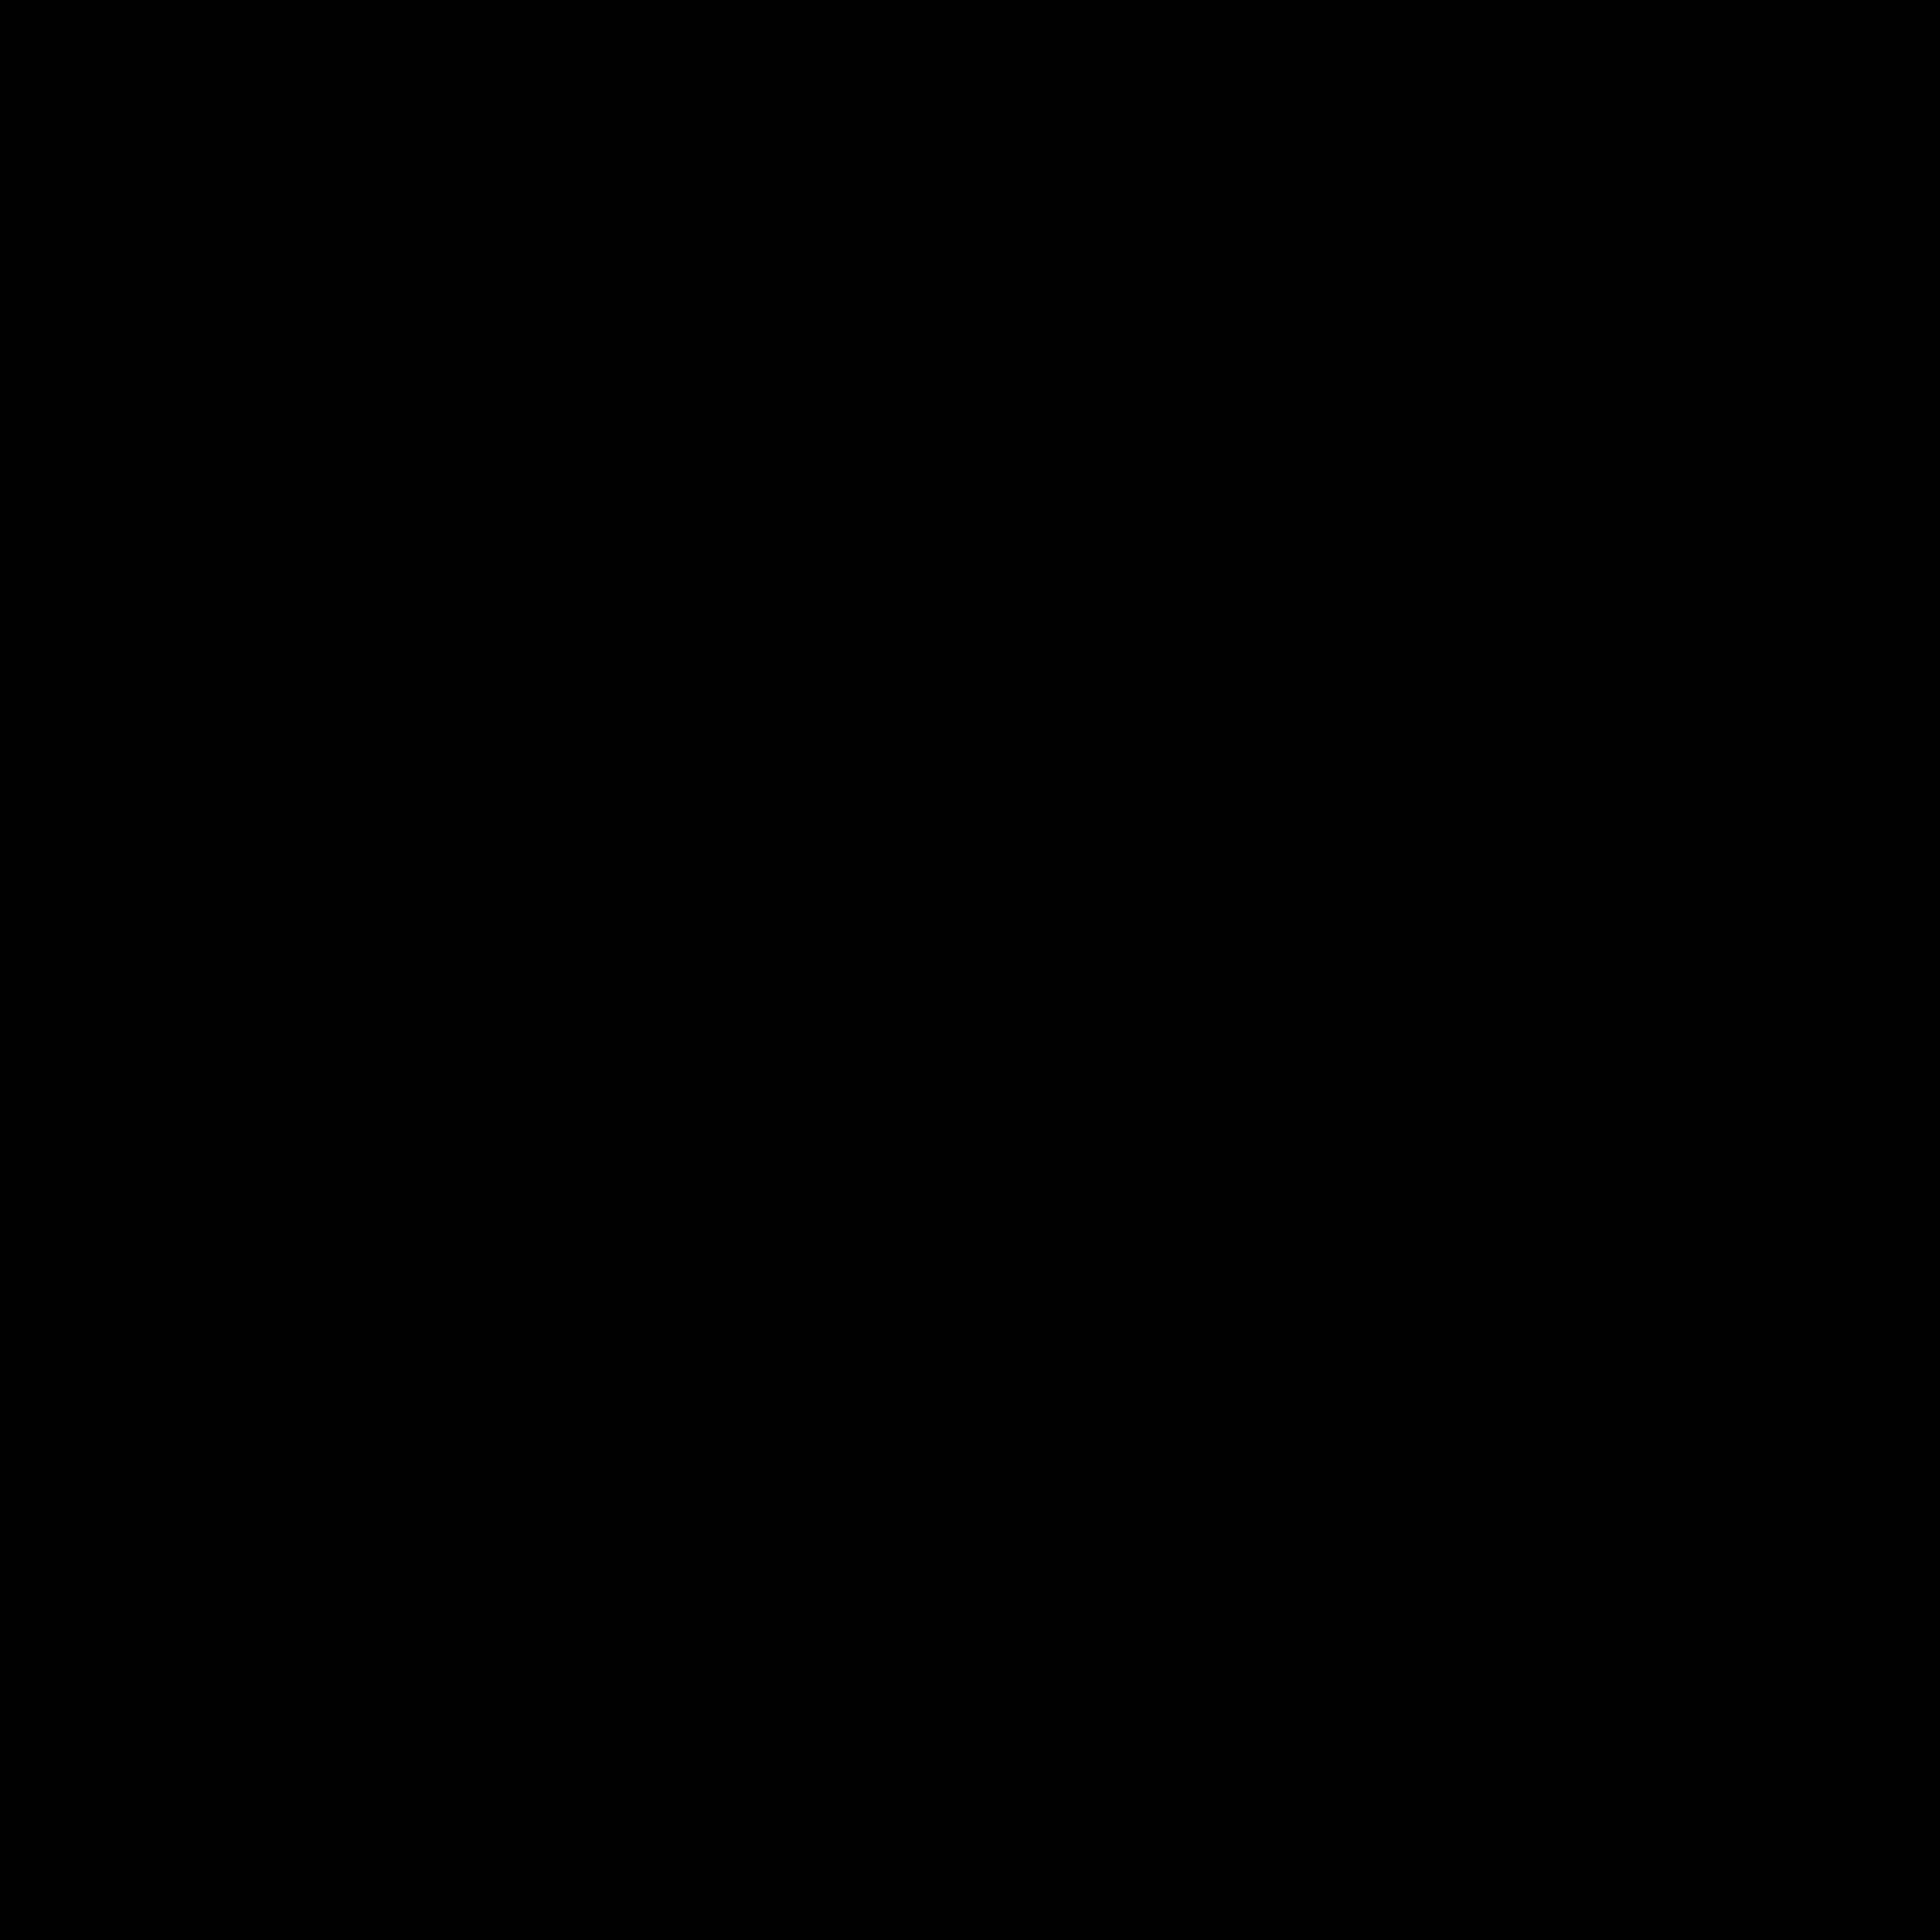 nbc-logo-png-transparent.png